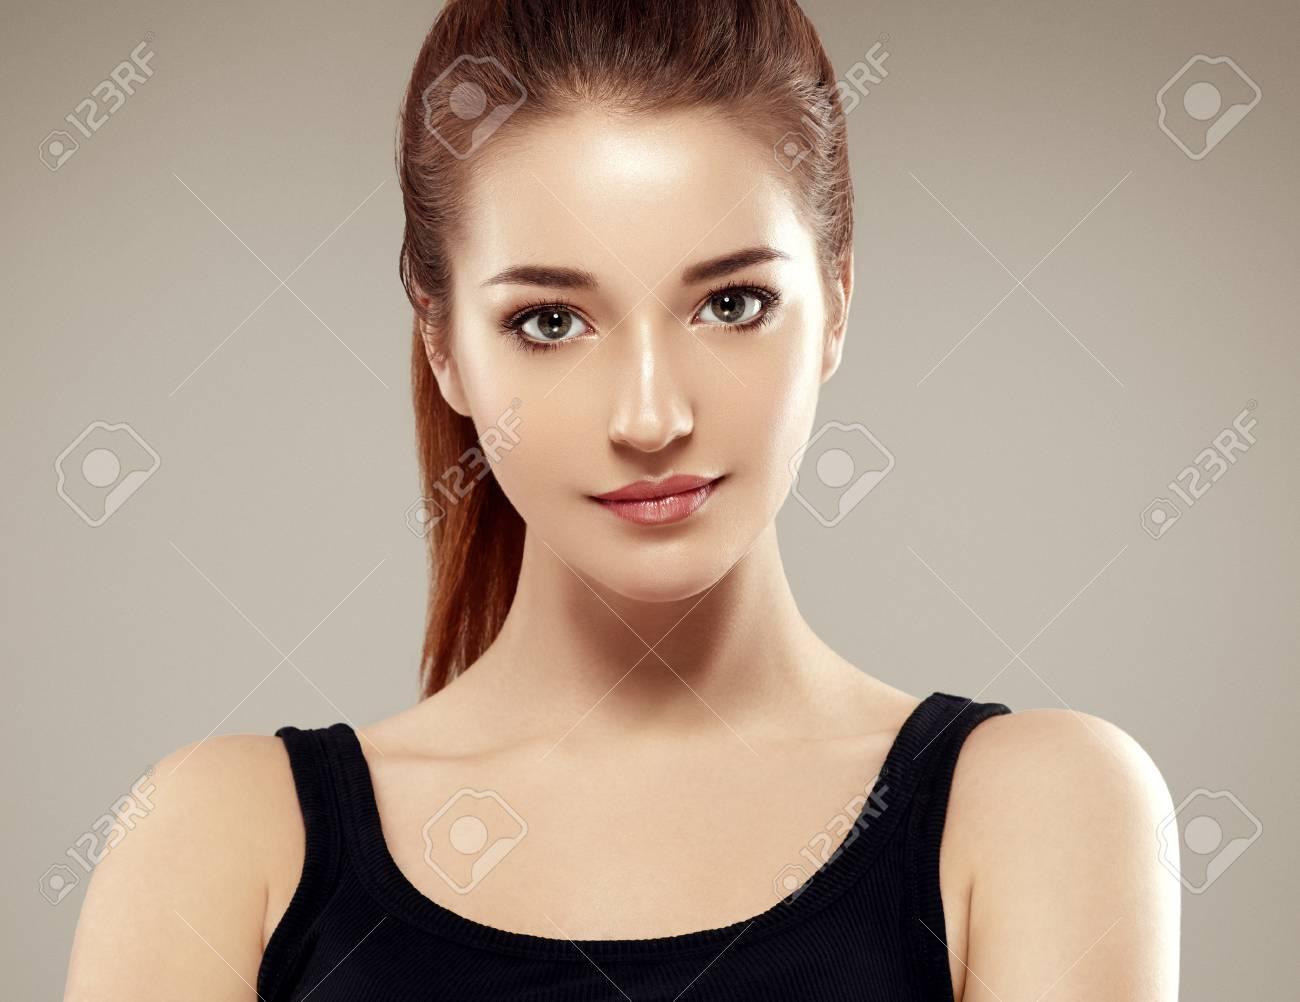 Beautiful woman face close up portrait young. Studio shot. Gray background. - 66203519